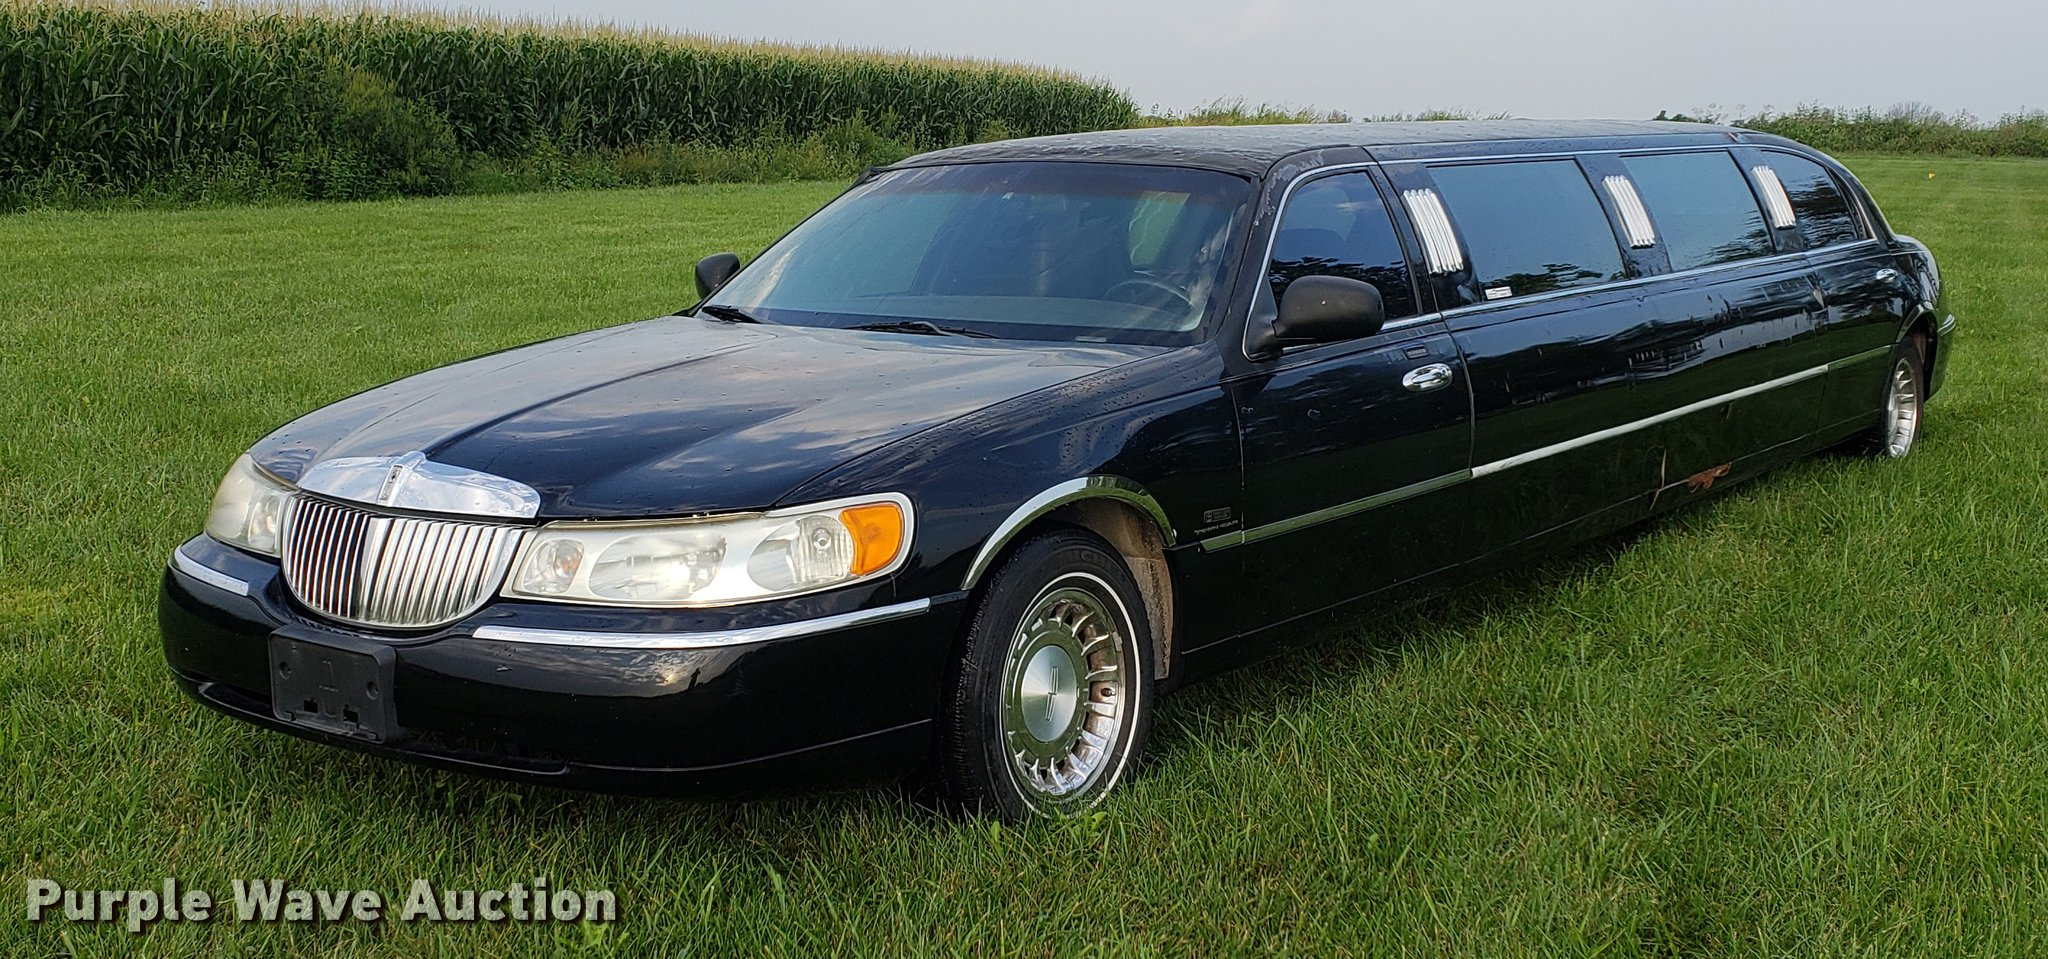 2000 Lincoln Town Car Limousine Item Bw9225 Sold Septem